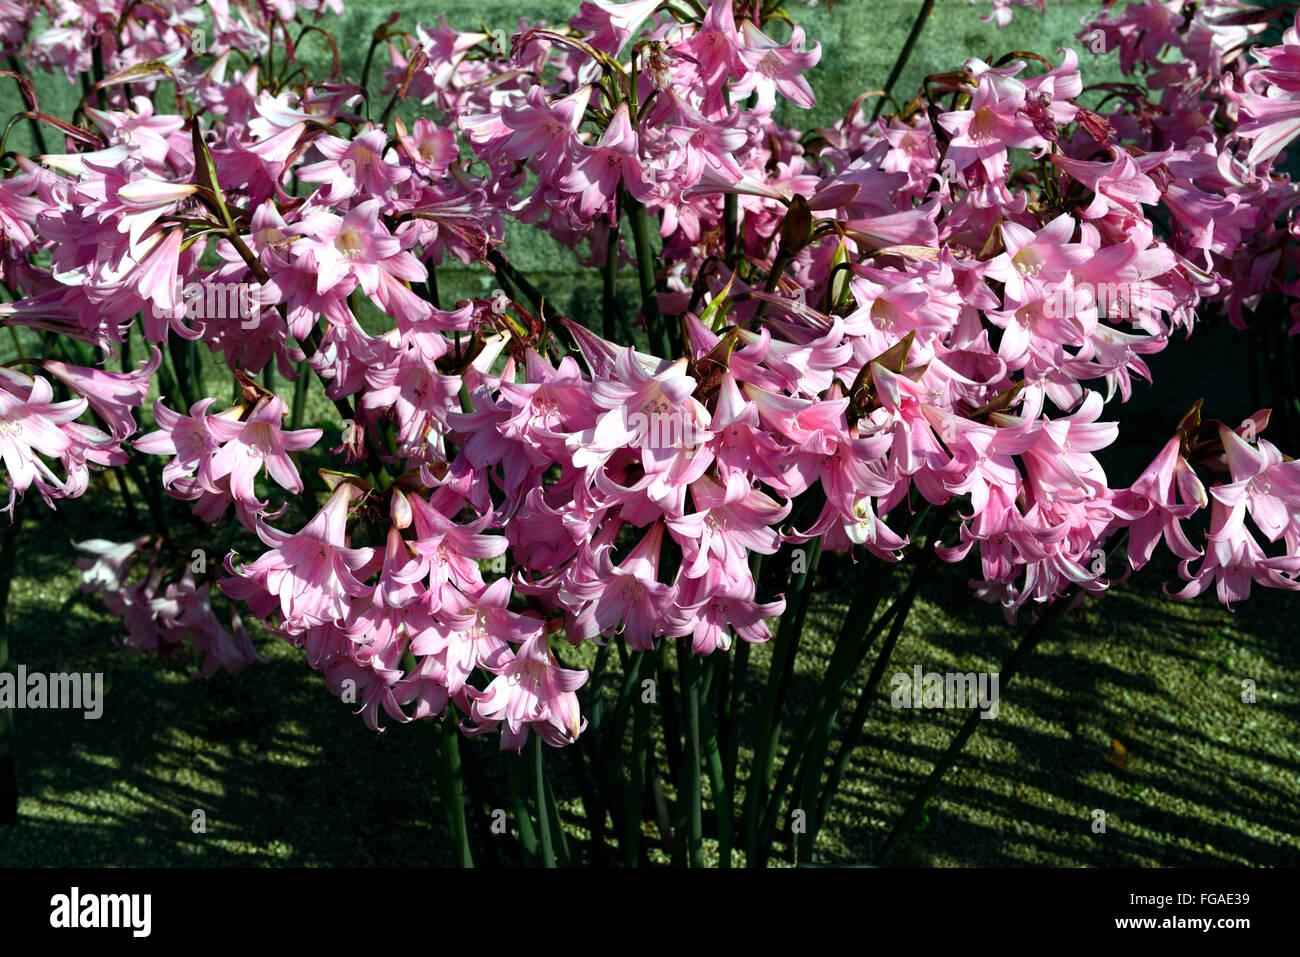 Fabelhaft Amaryllis Belladonna Stock Photos & Amaryllis Belladonna Stock &OP_43